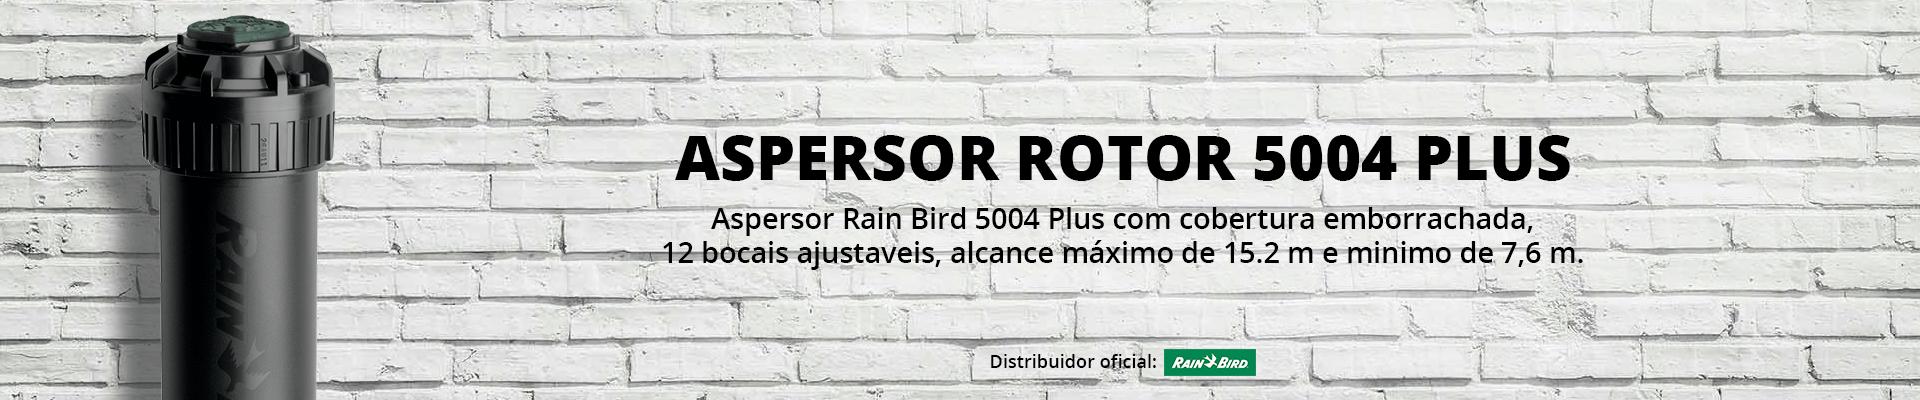 Aspersor ROTOR 5004 Plus - Rain Bird